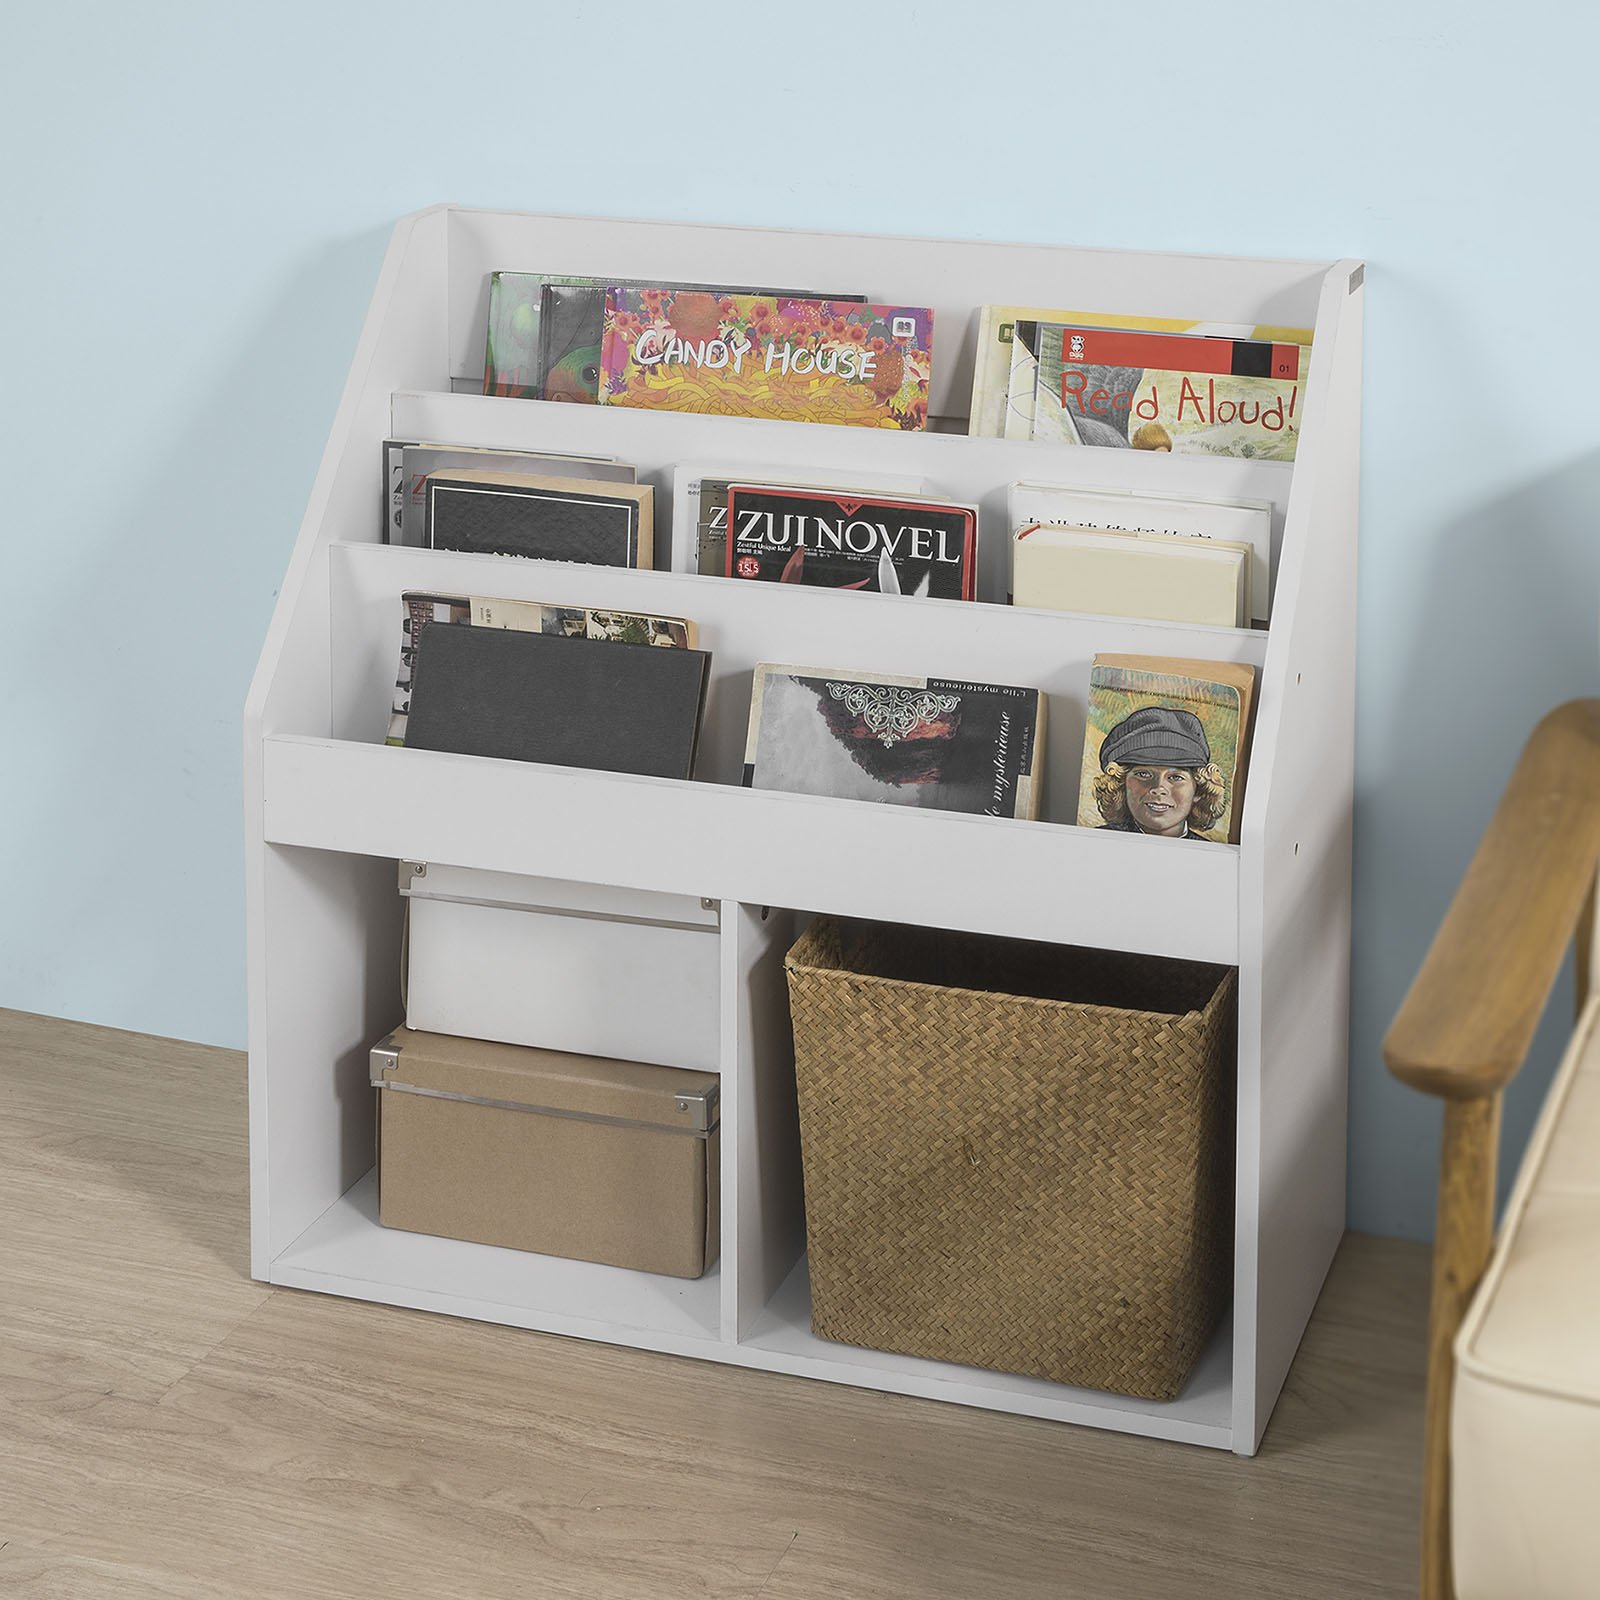 Haotian KMB01-W, White Children Kids Bookcase Book Shelf Storage Display Rack Organizer Holder by Haotian